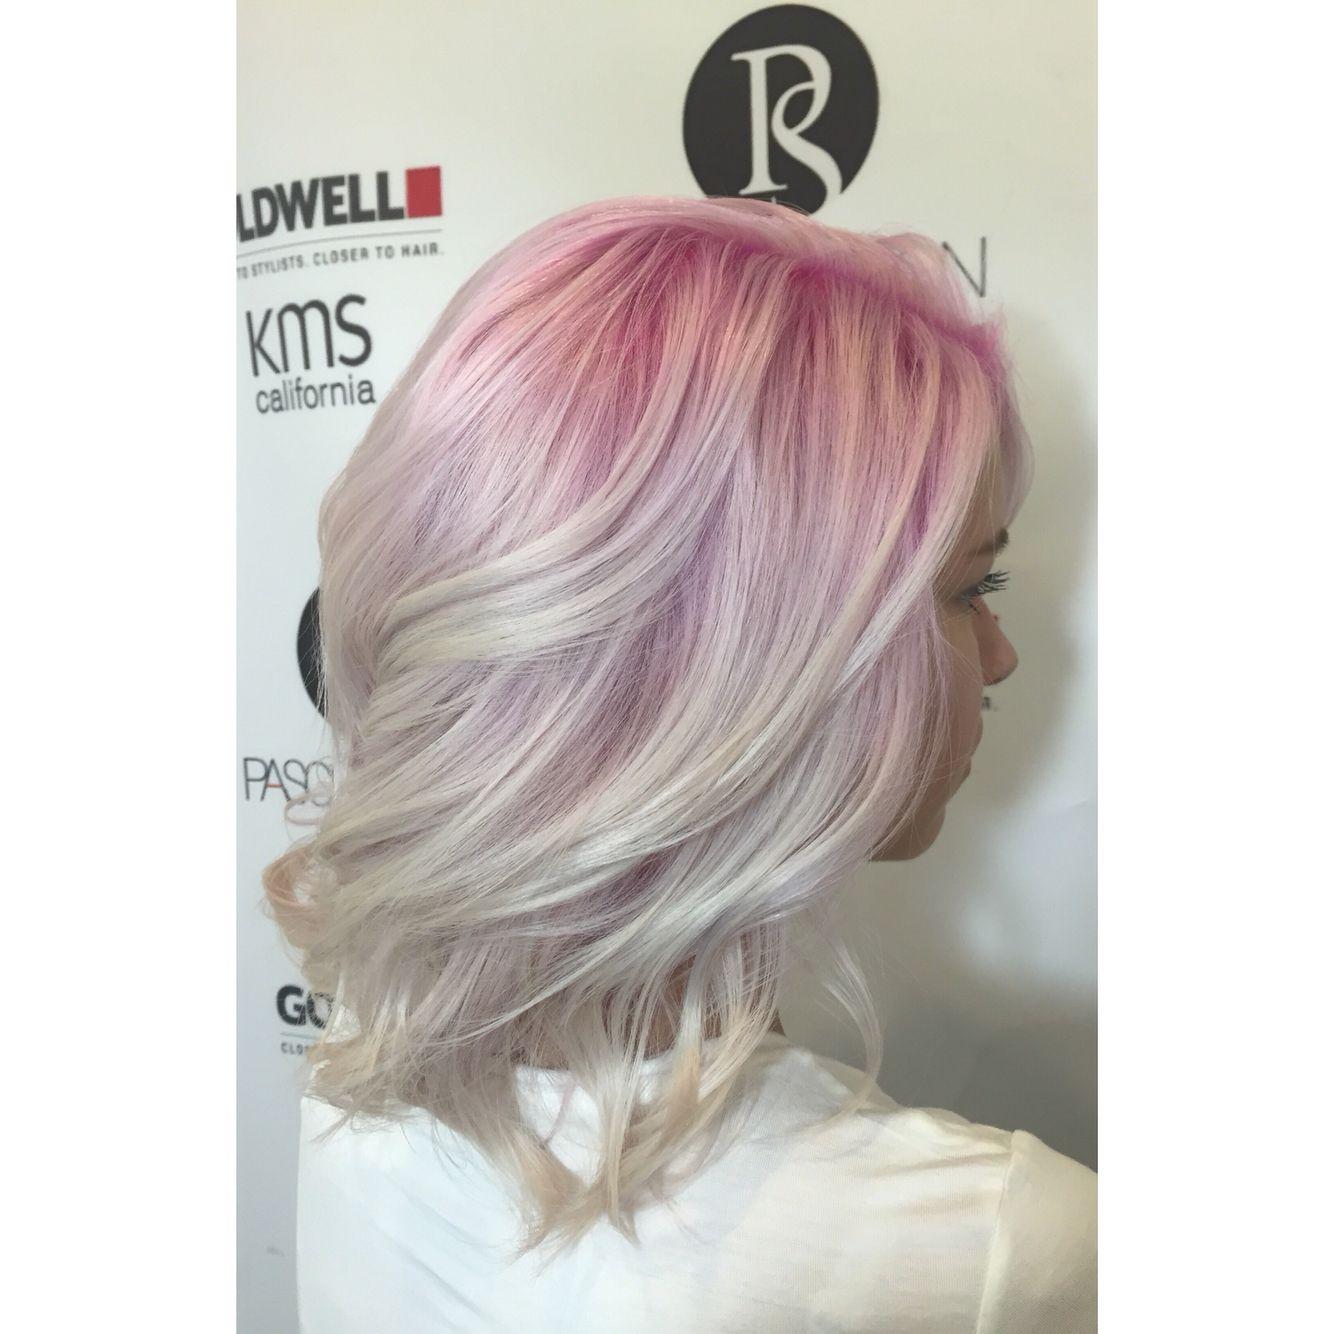 Blush/pink roots on platinum hair.